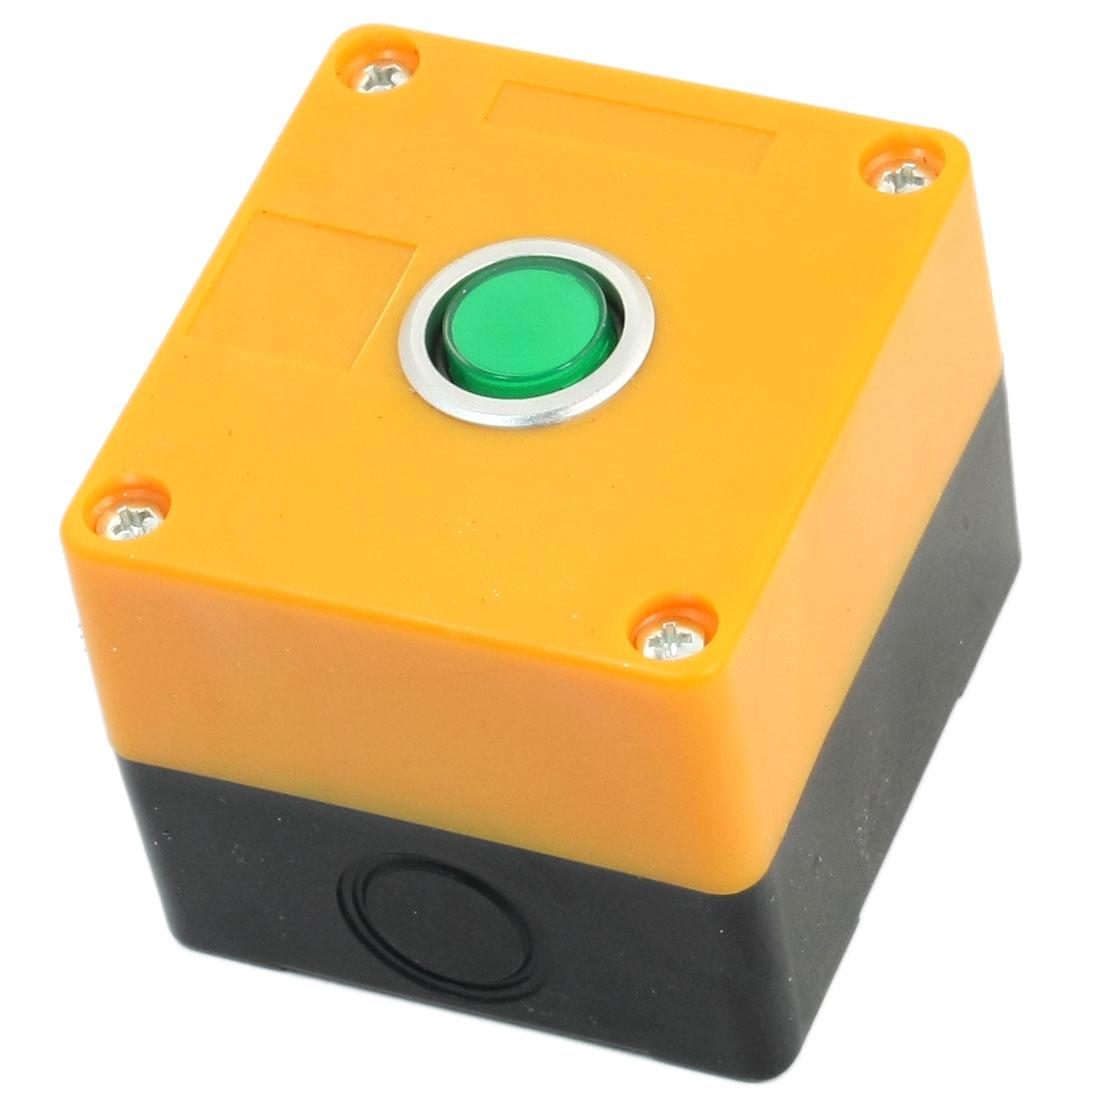 AC 220V 5A Green Pilot Lamp SPDT 1NO 1NC 5 Pins Self-locking Yellow Plastic Case Push Button Control Station Box